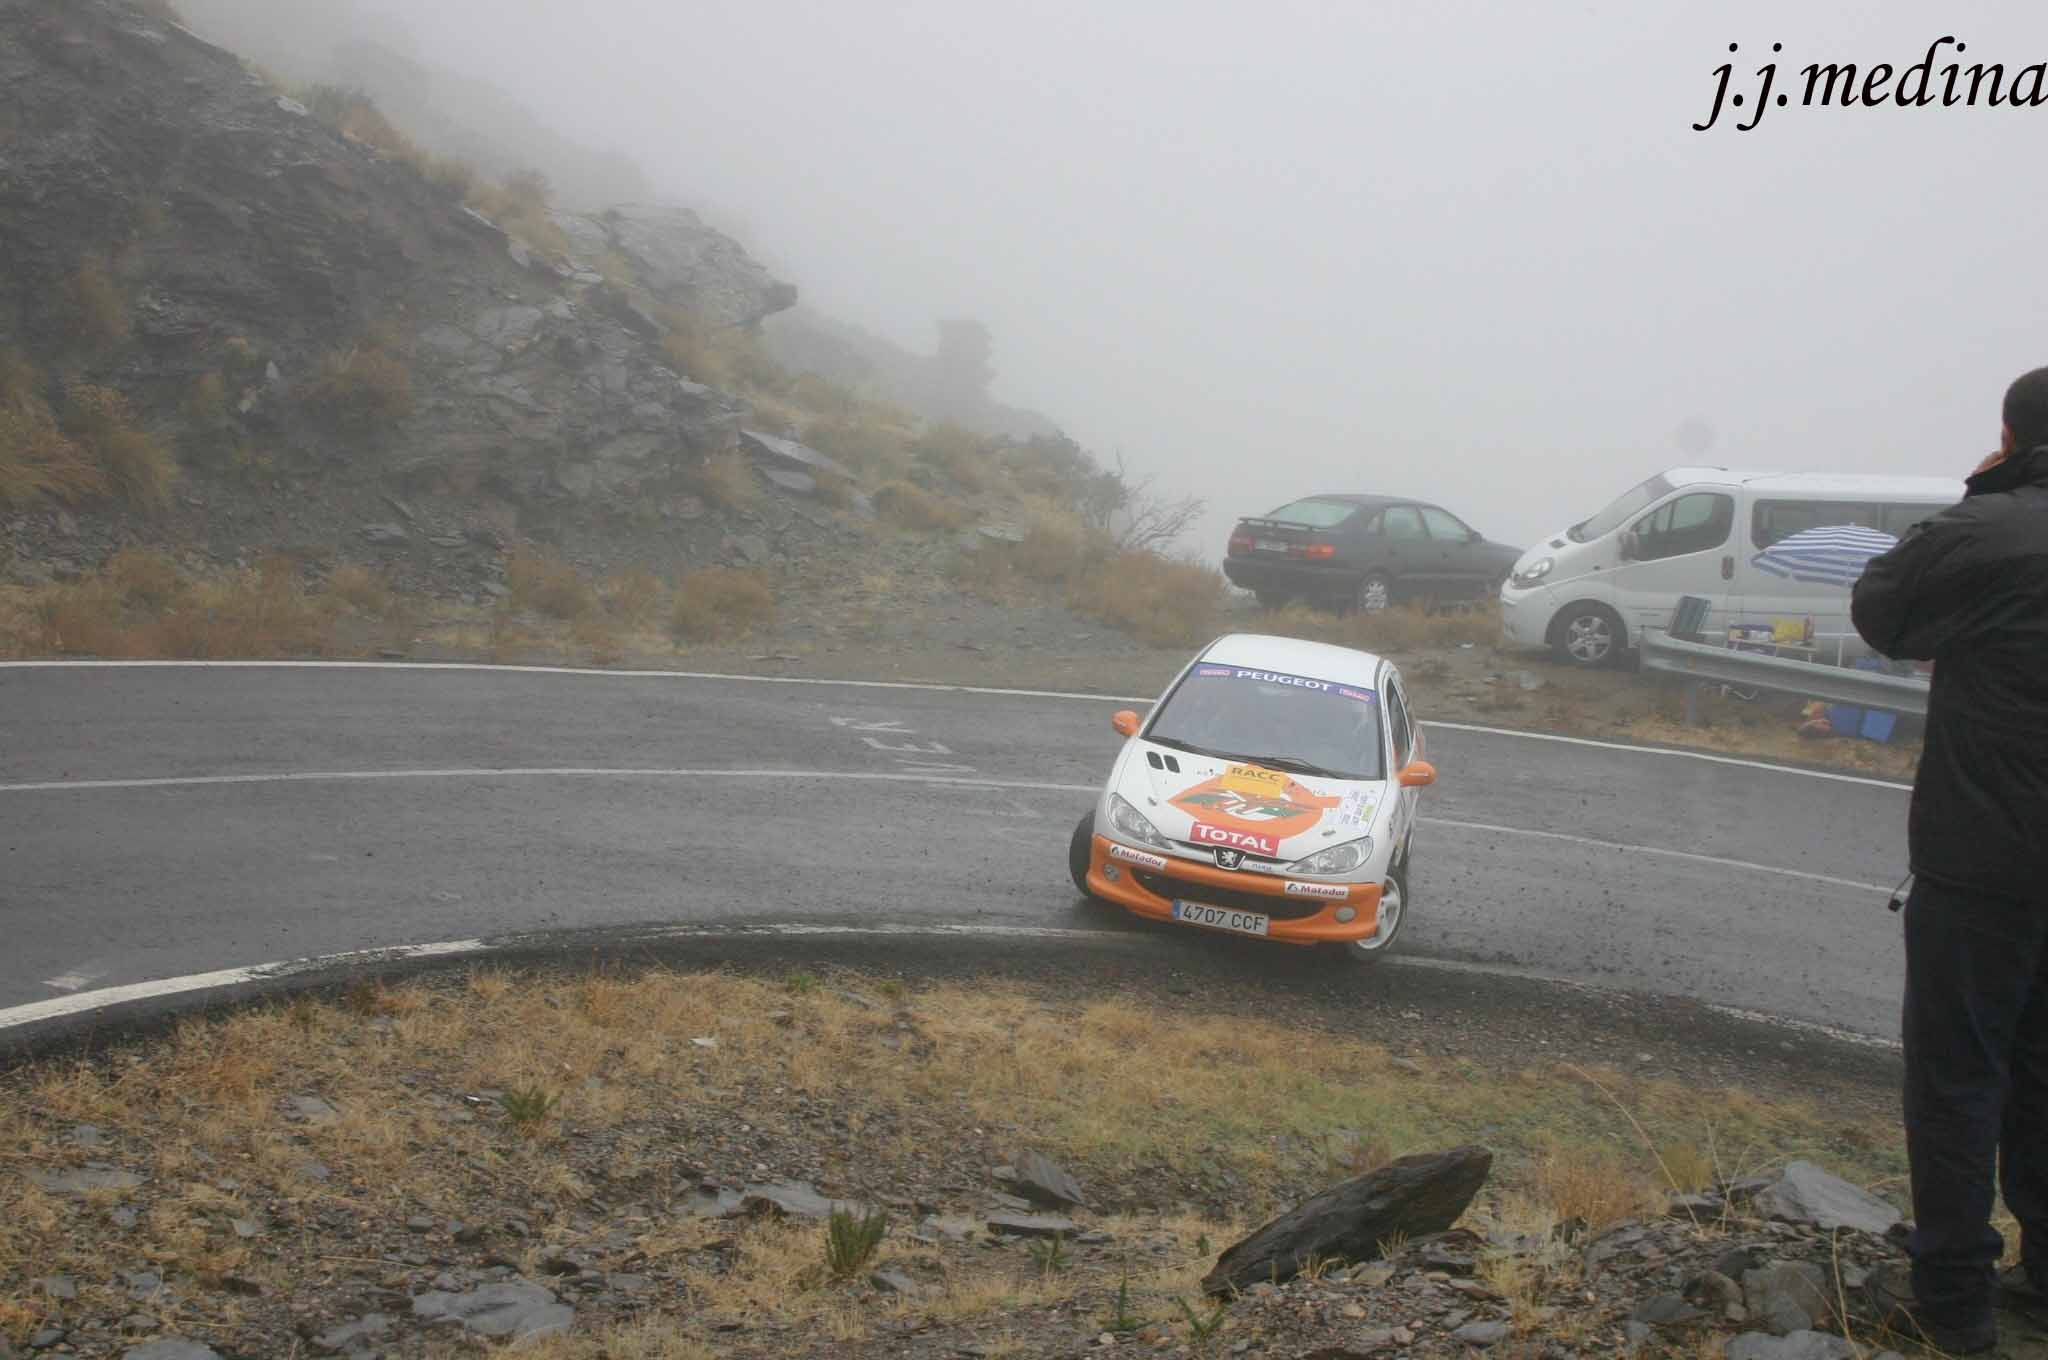 39660 86 Anos Mickey Mouse likewise Rallye Ciudad De Almeria 2006 in addition Ccie as well Pais mapa likewise 867045. on luis de la cruz